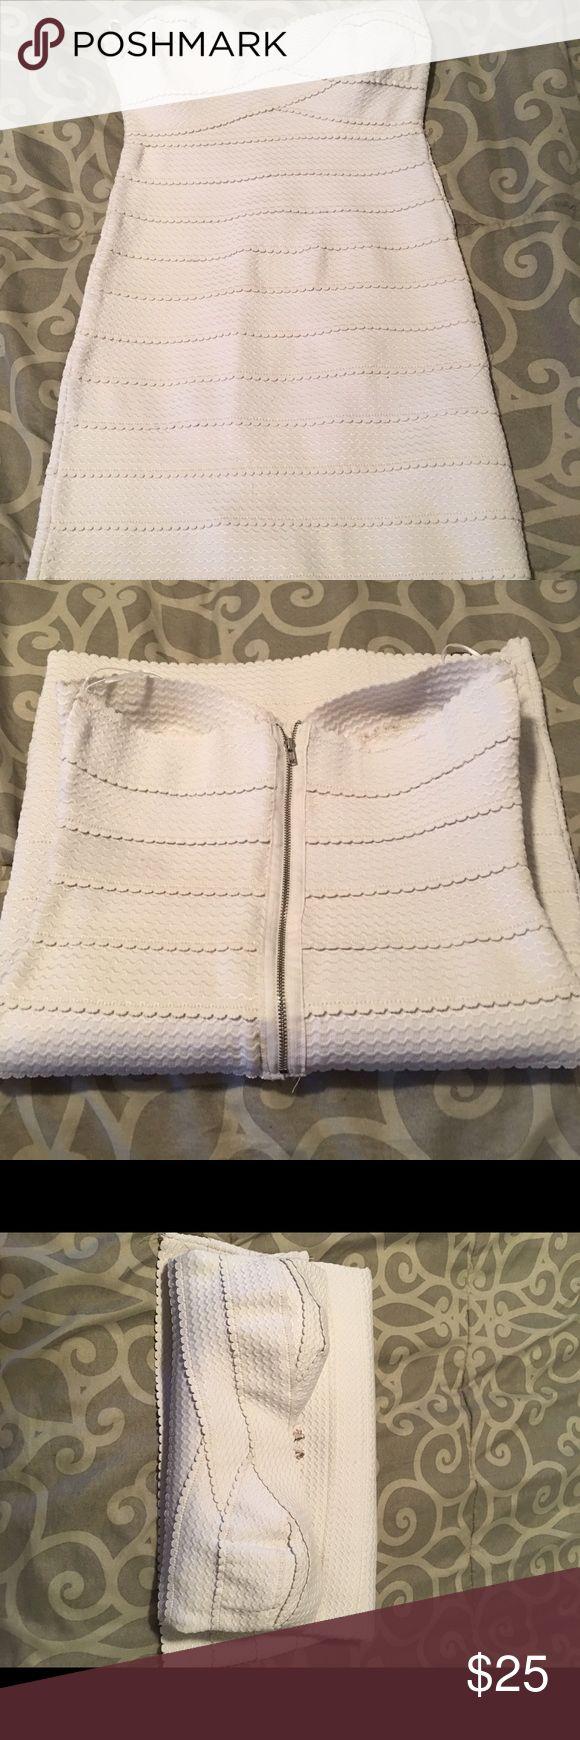 White bandage dress Bandage dress Dresses Mini